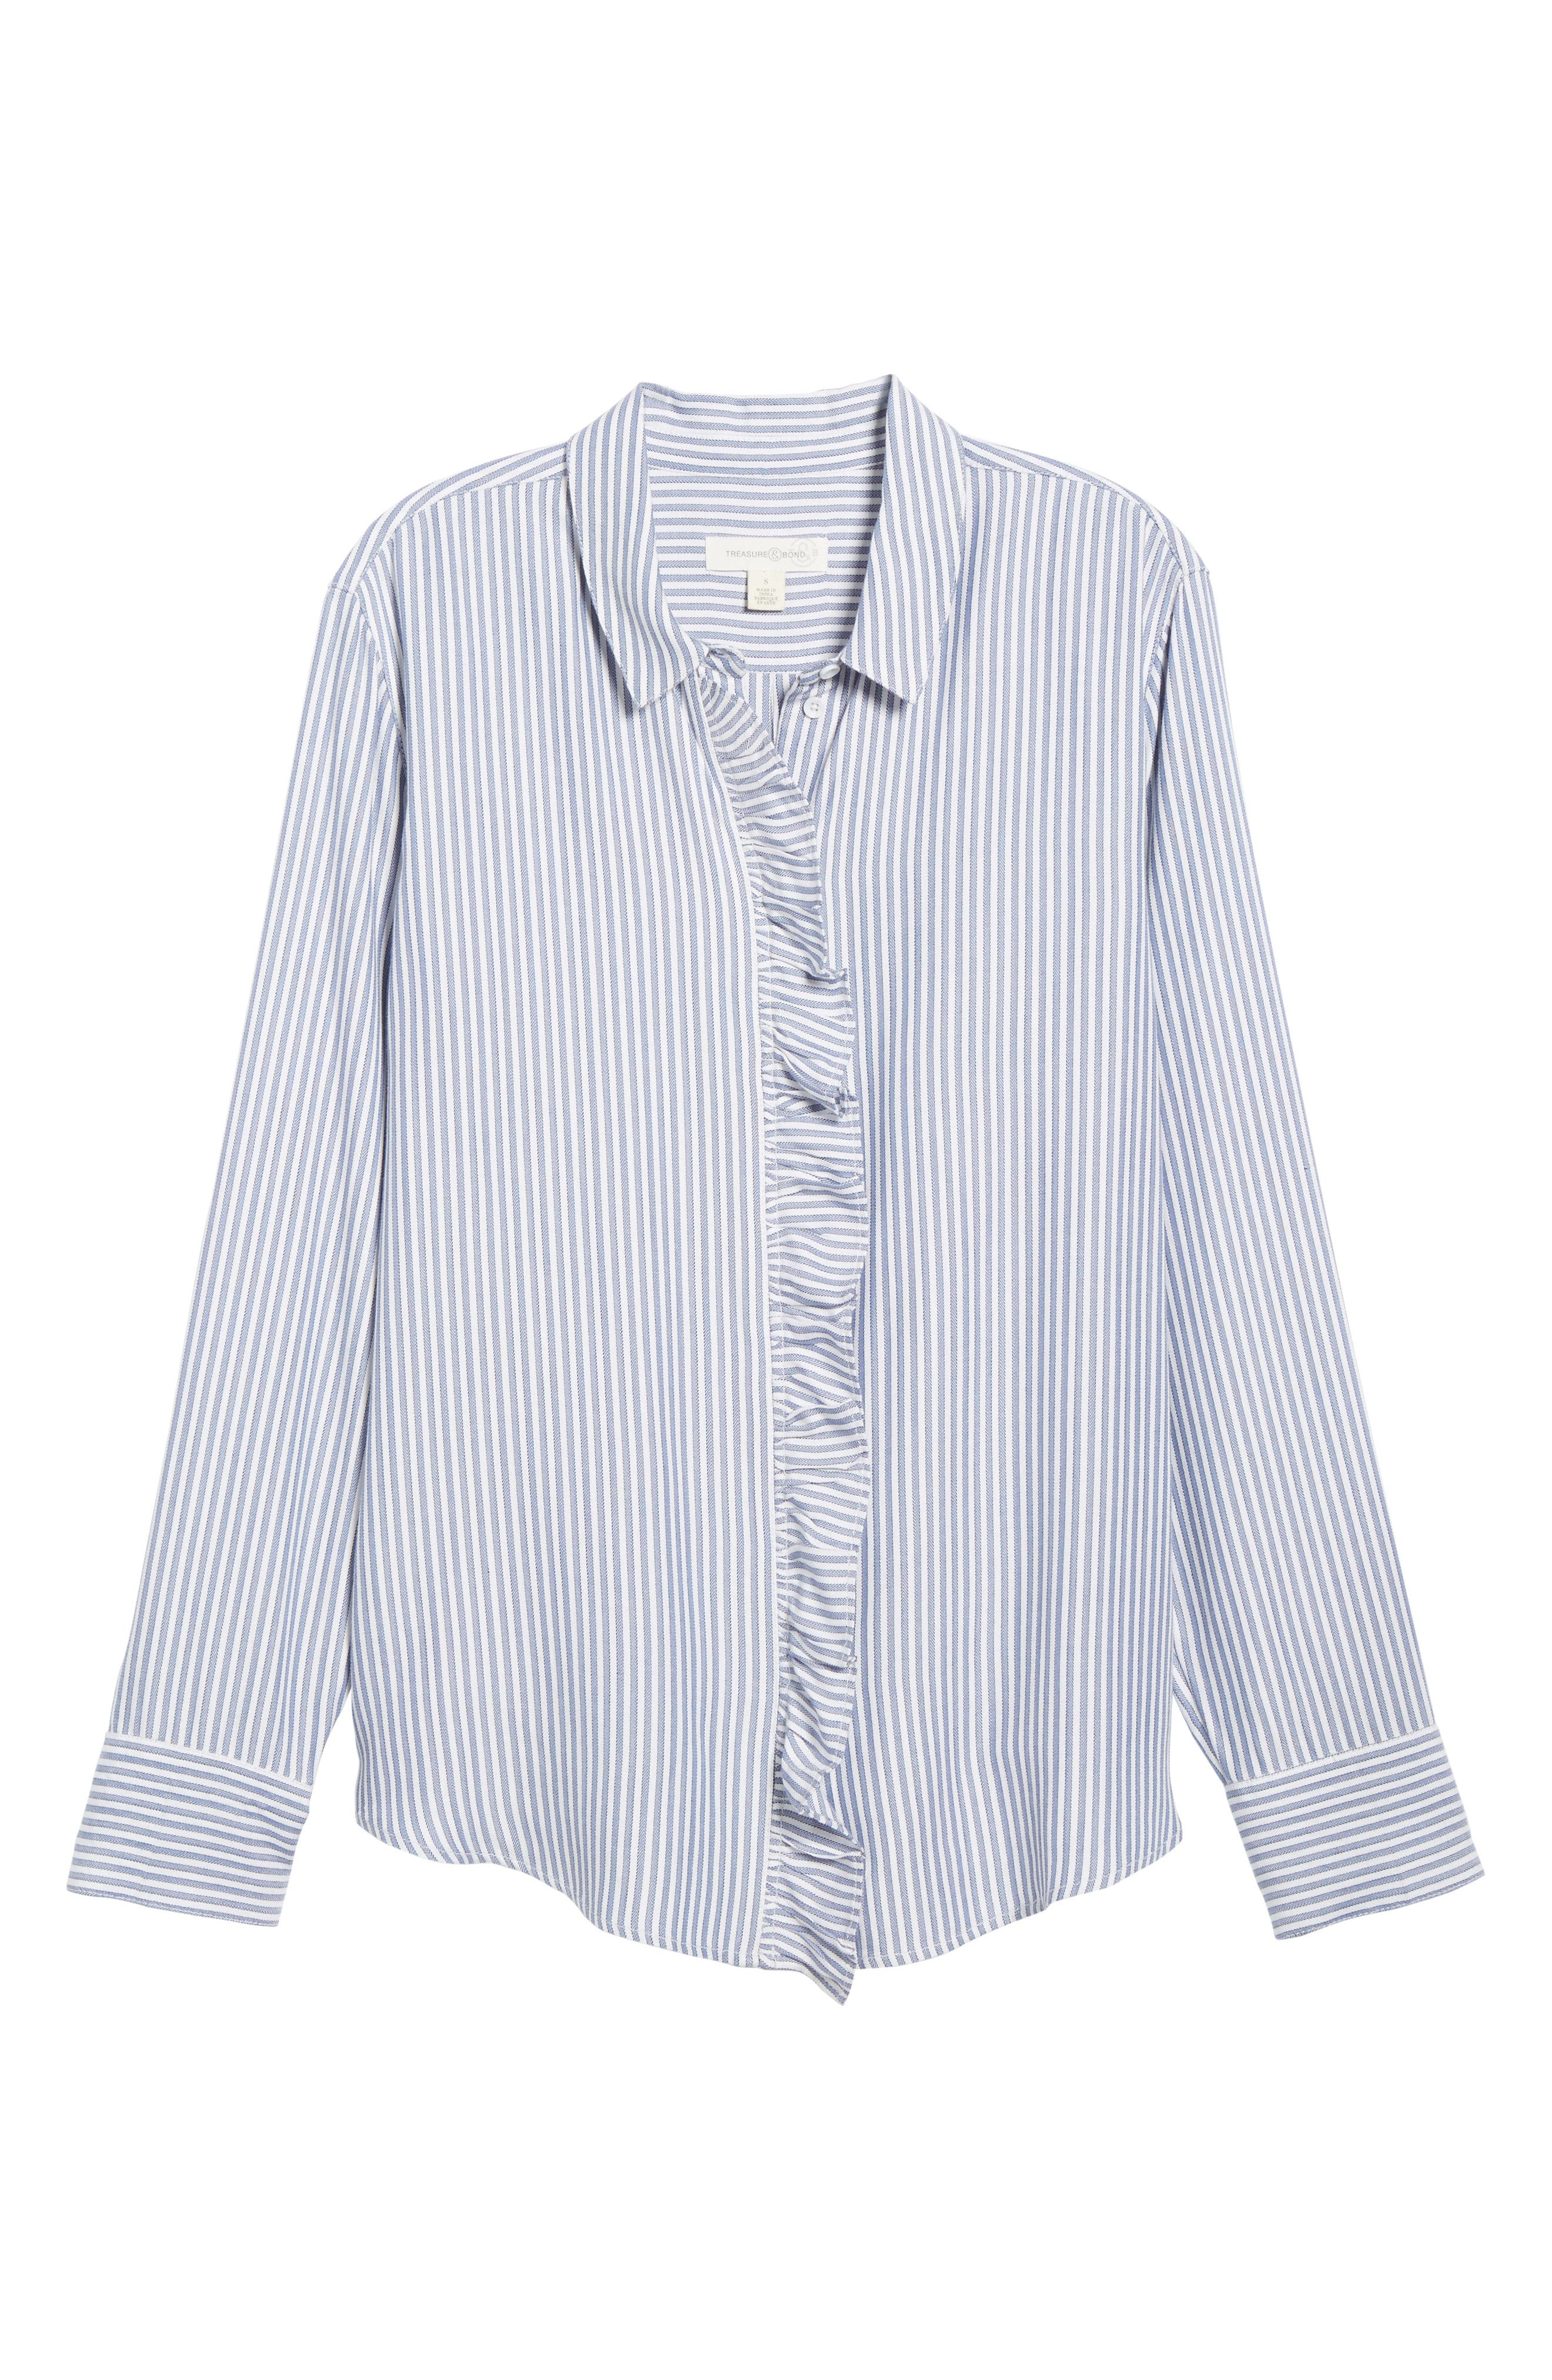 Stripe Ruffle Shirt,                             Alternate thumbnail 6, color,                             White Double Oxford Stripe